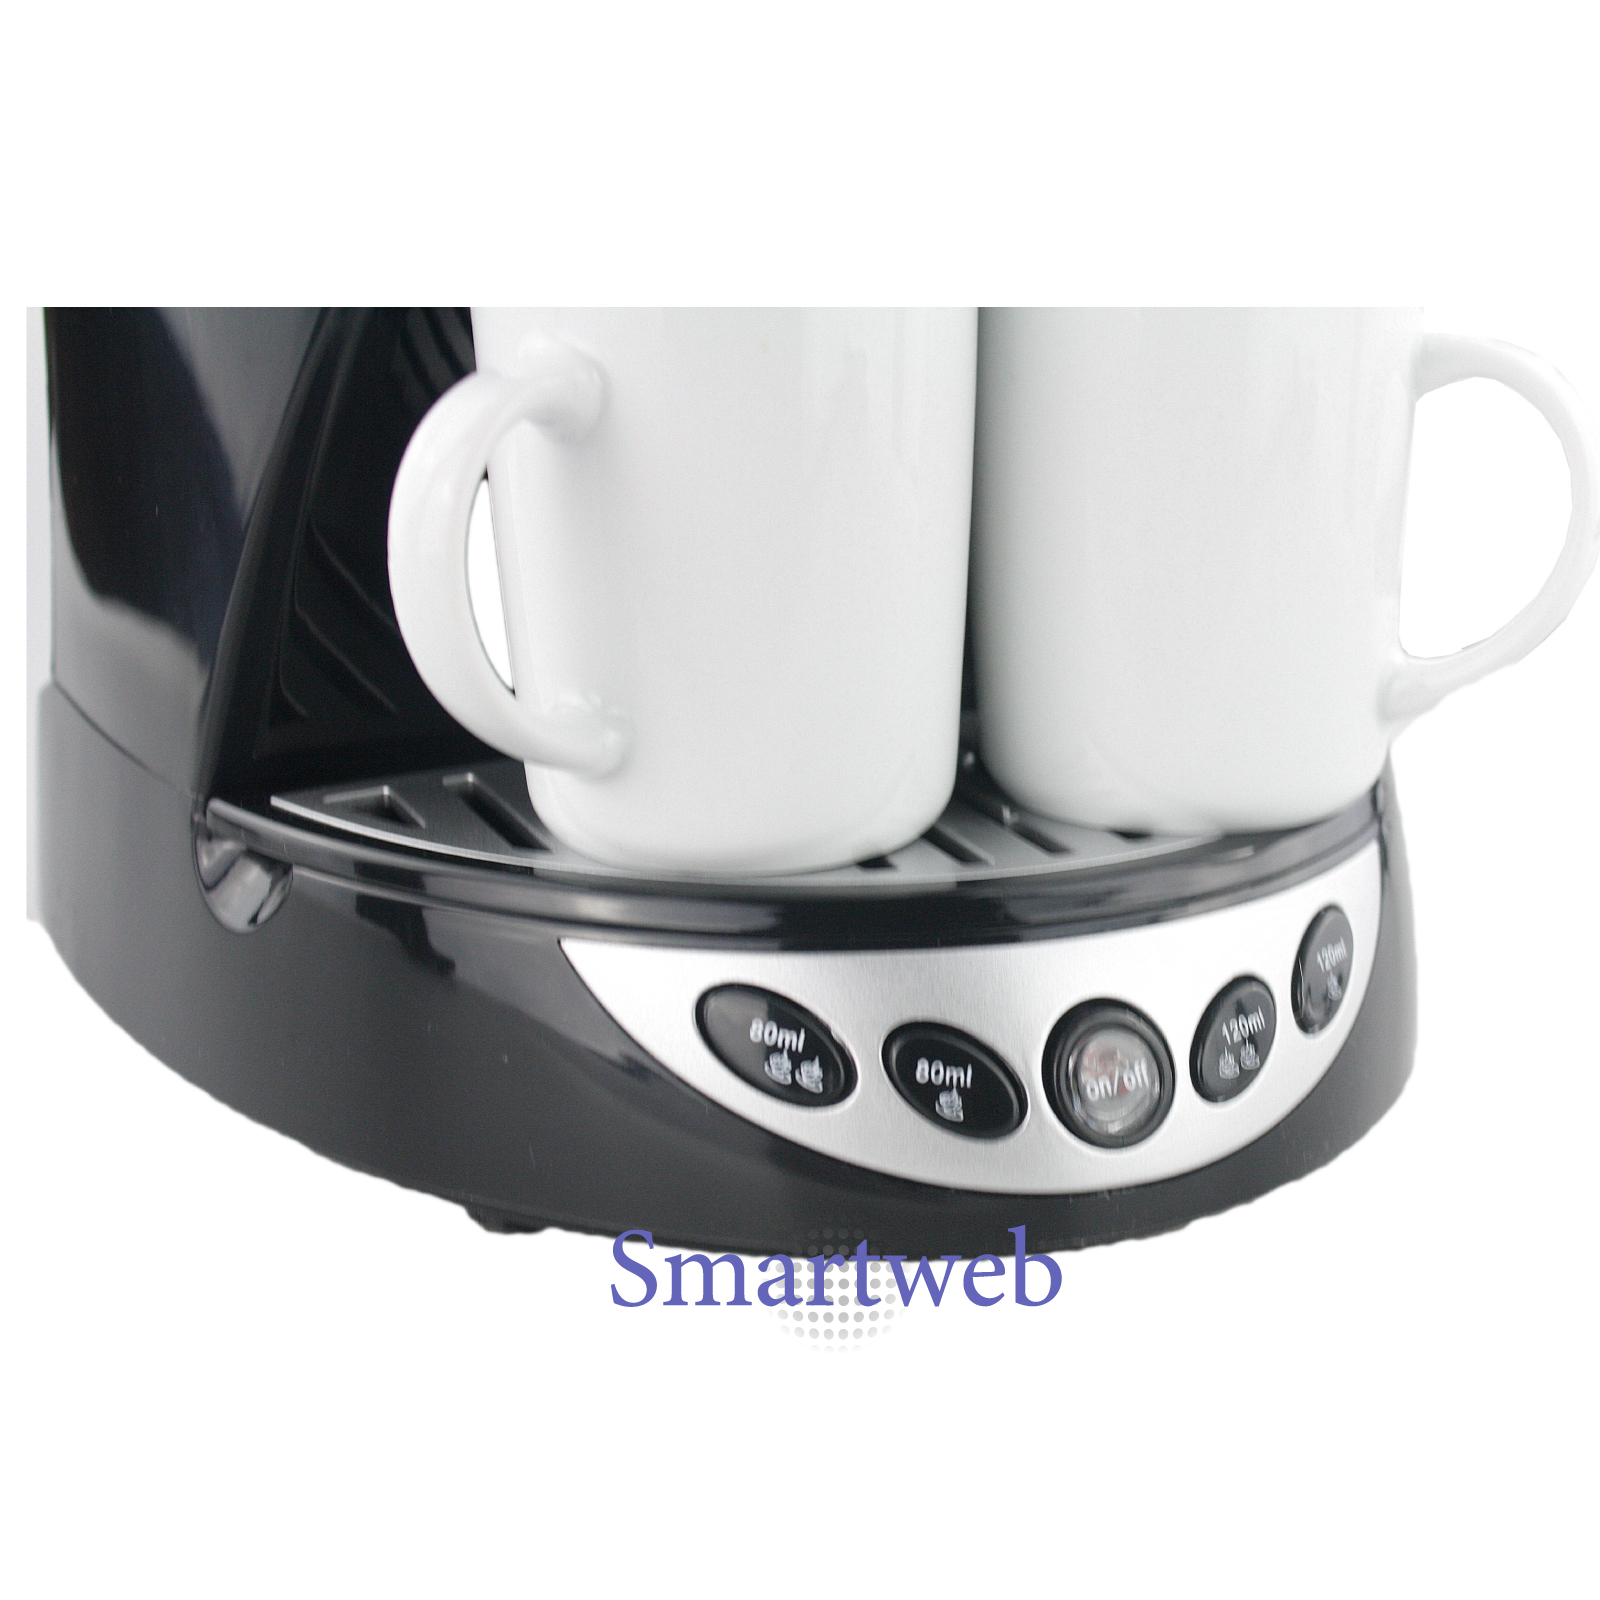 pad kaffeemaschine kaffeepadmaschine kaffee maschine. Black Bedroom Furniture Sets. Home Design Ideas